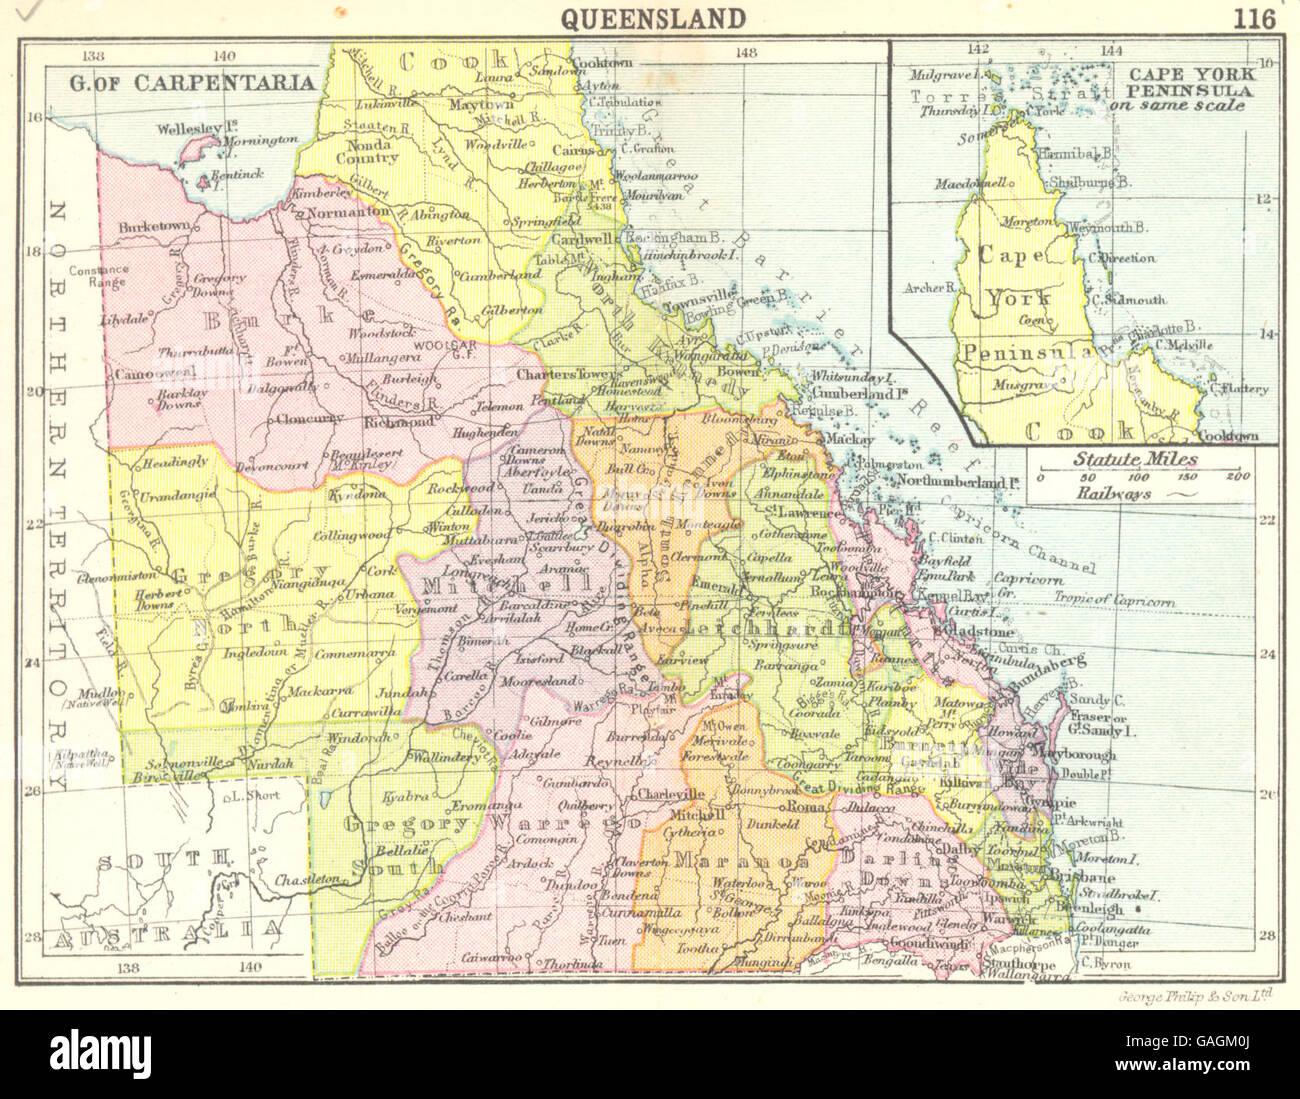 Map Of Australia Cape York Peninsula.Australia Queensland Inset Map Of Cape York Peninsula Small Map